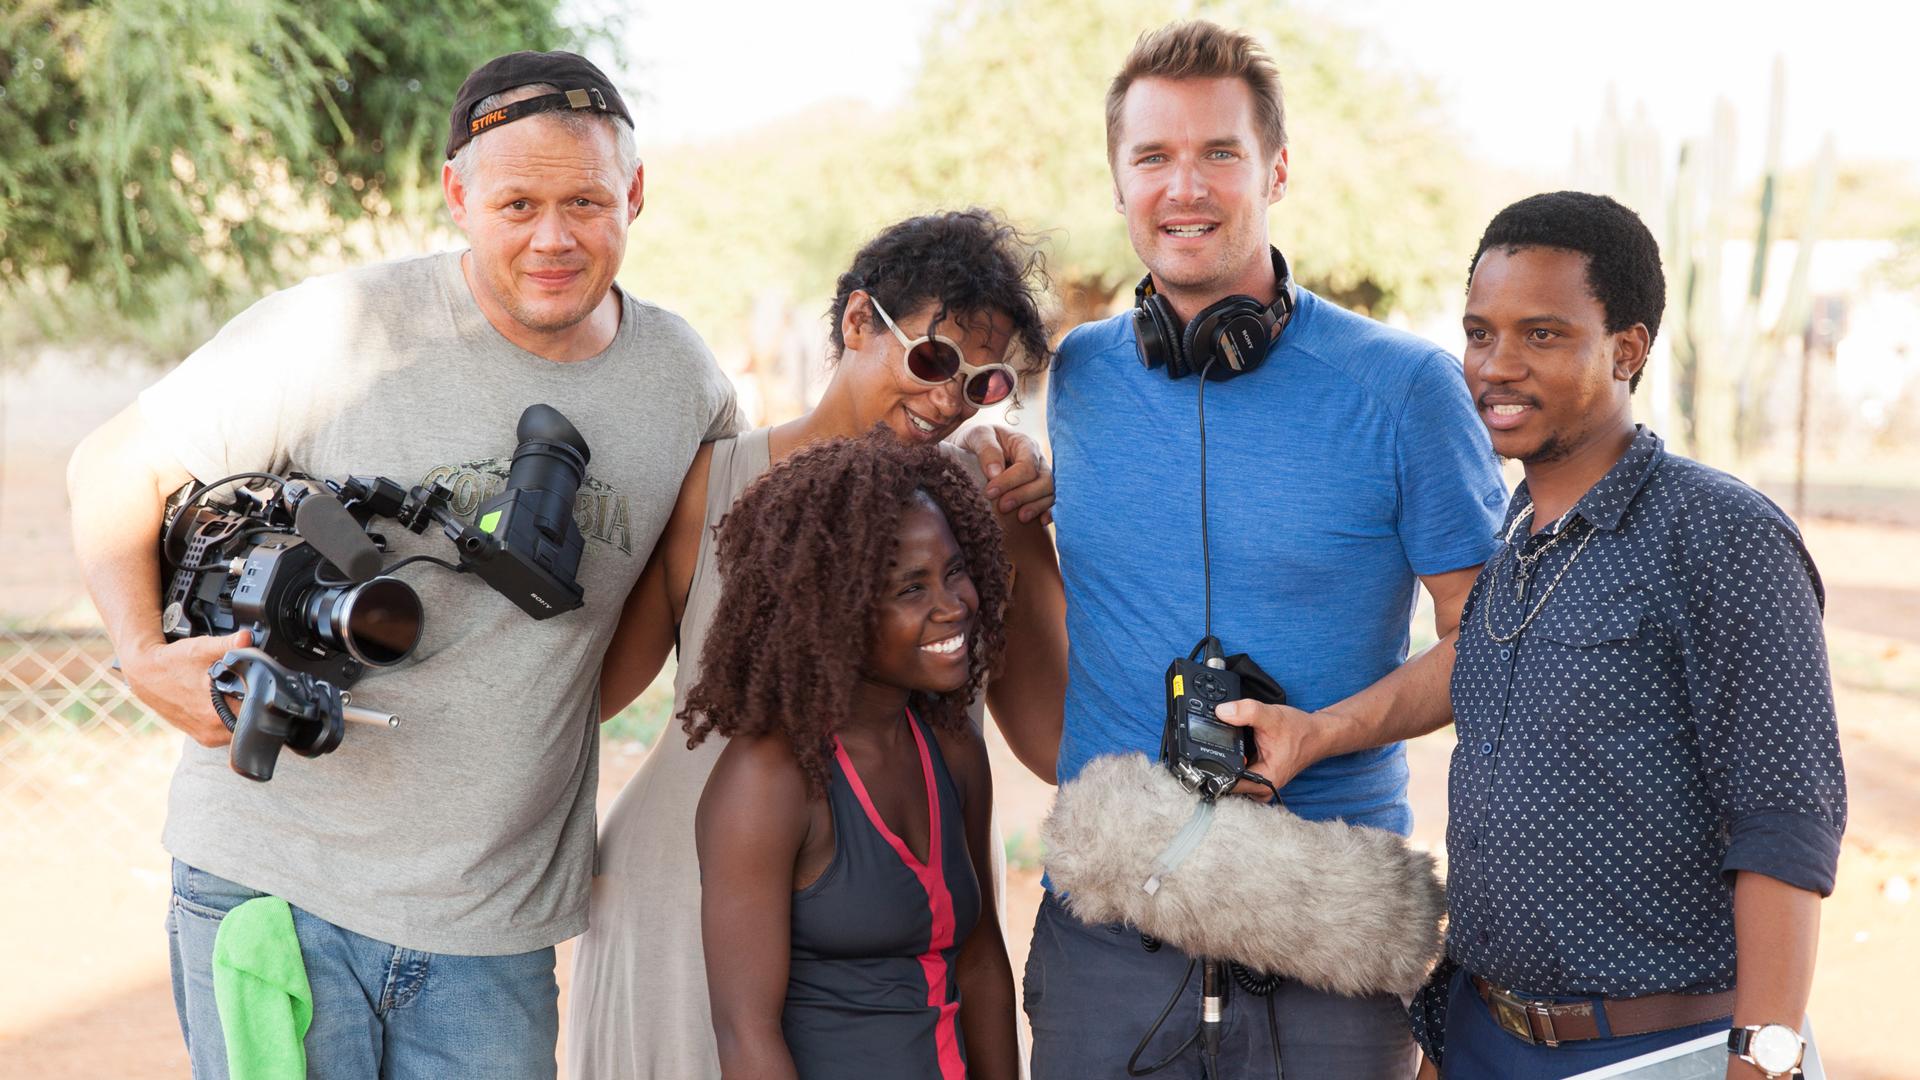 Arte Documentary - Queens of Botswana - Making of Image 7